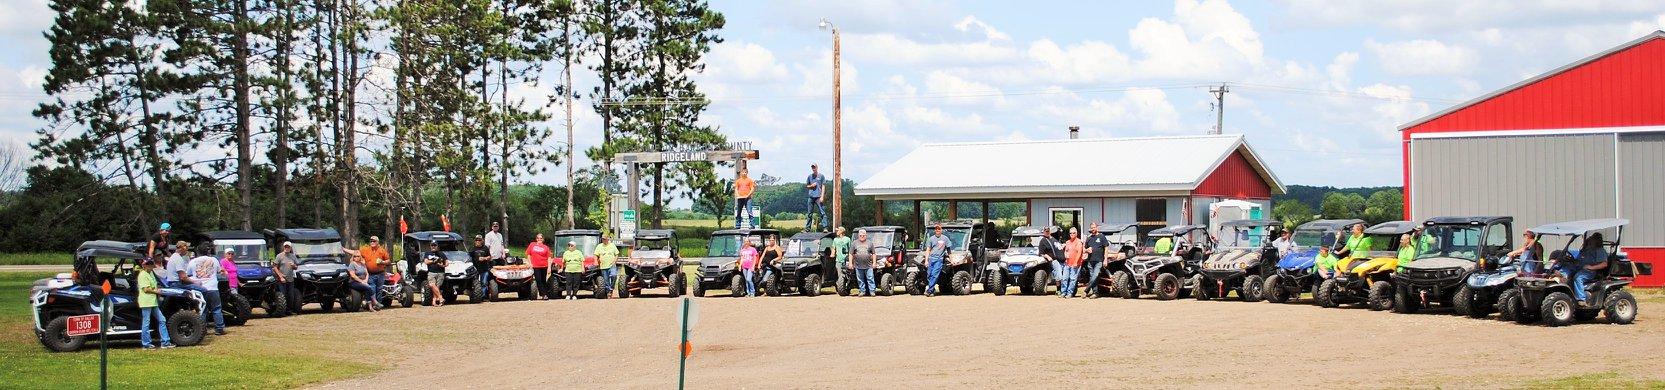 Dunn County ATV / UTV Association